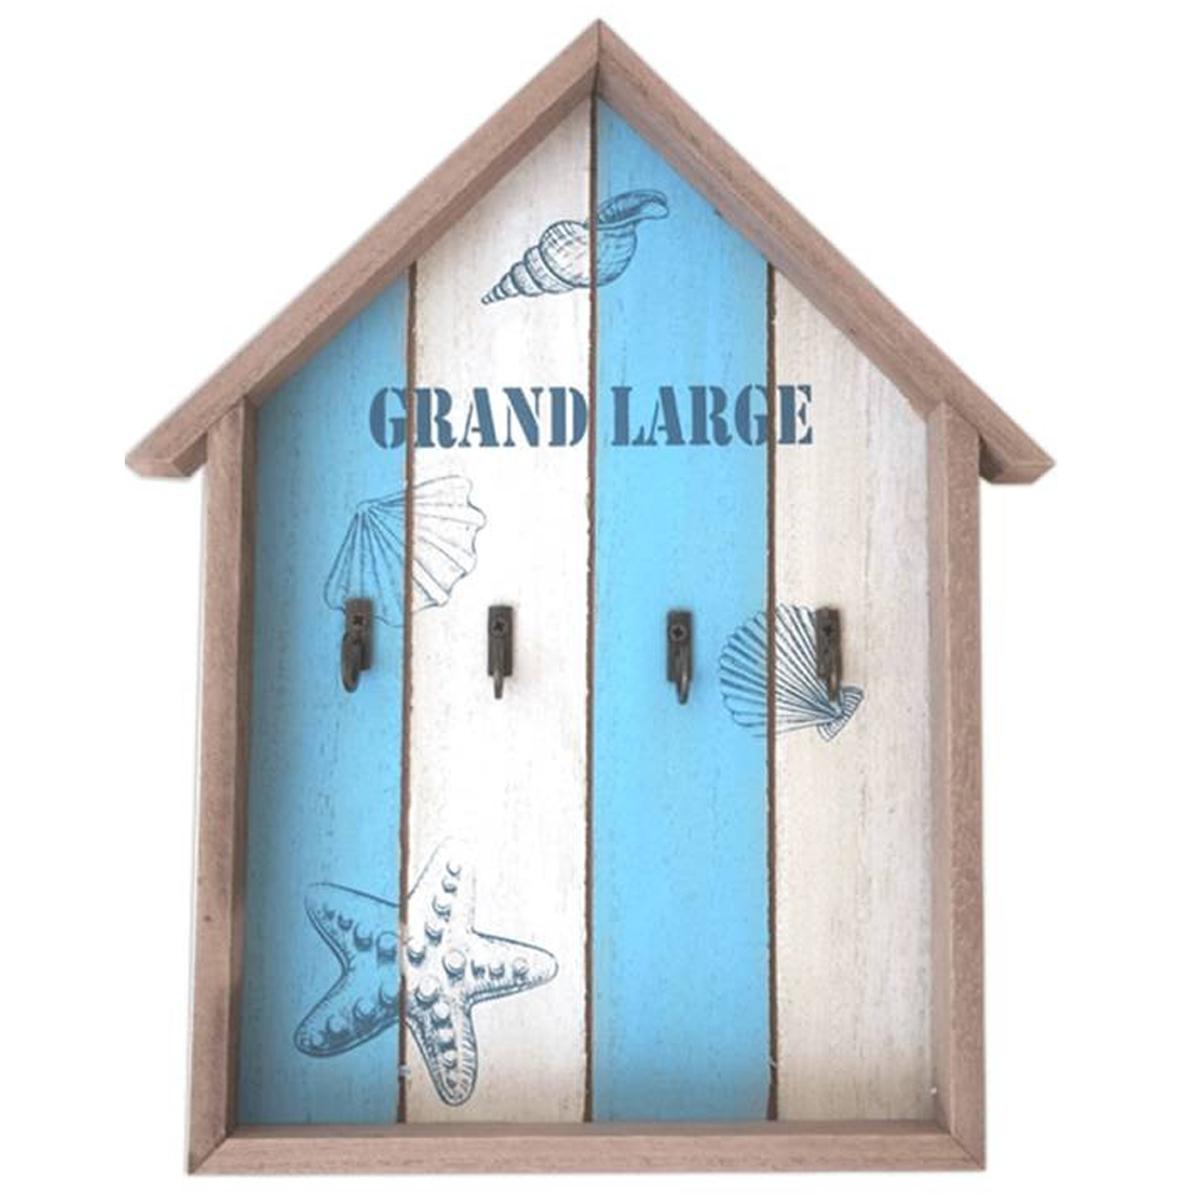 Boite à clés bois \'Monde Marin\' bleu blanc beige (grand large) - 305x24x35 cm - [P8816]